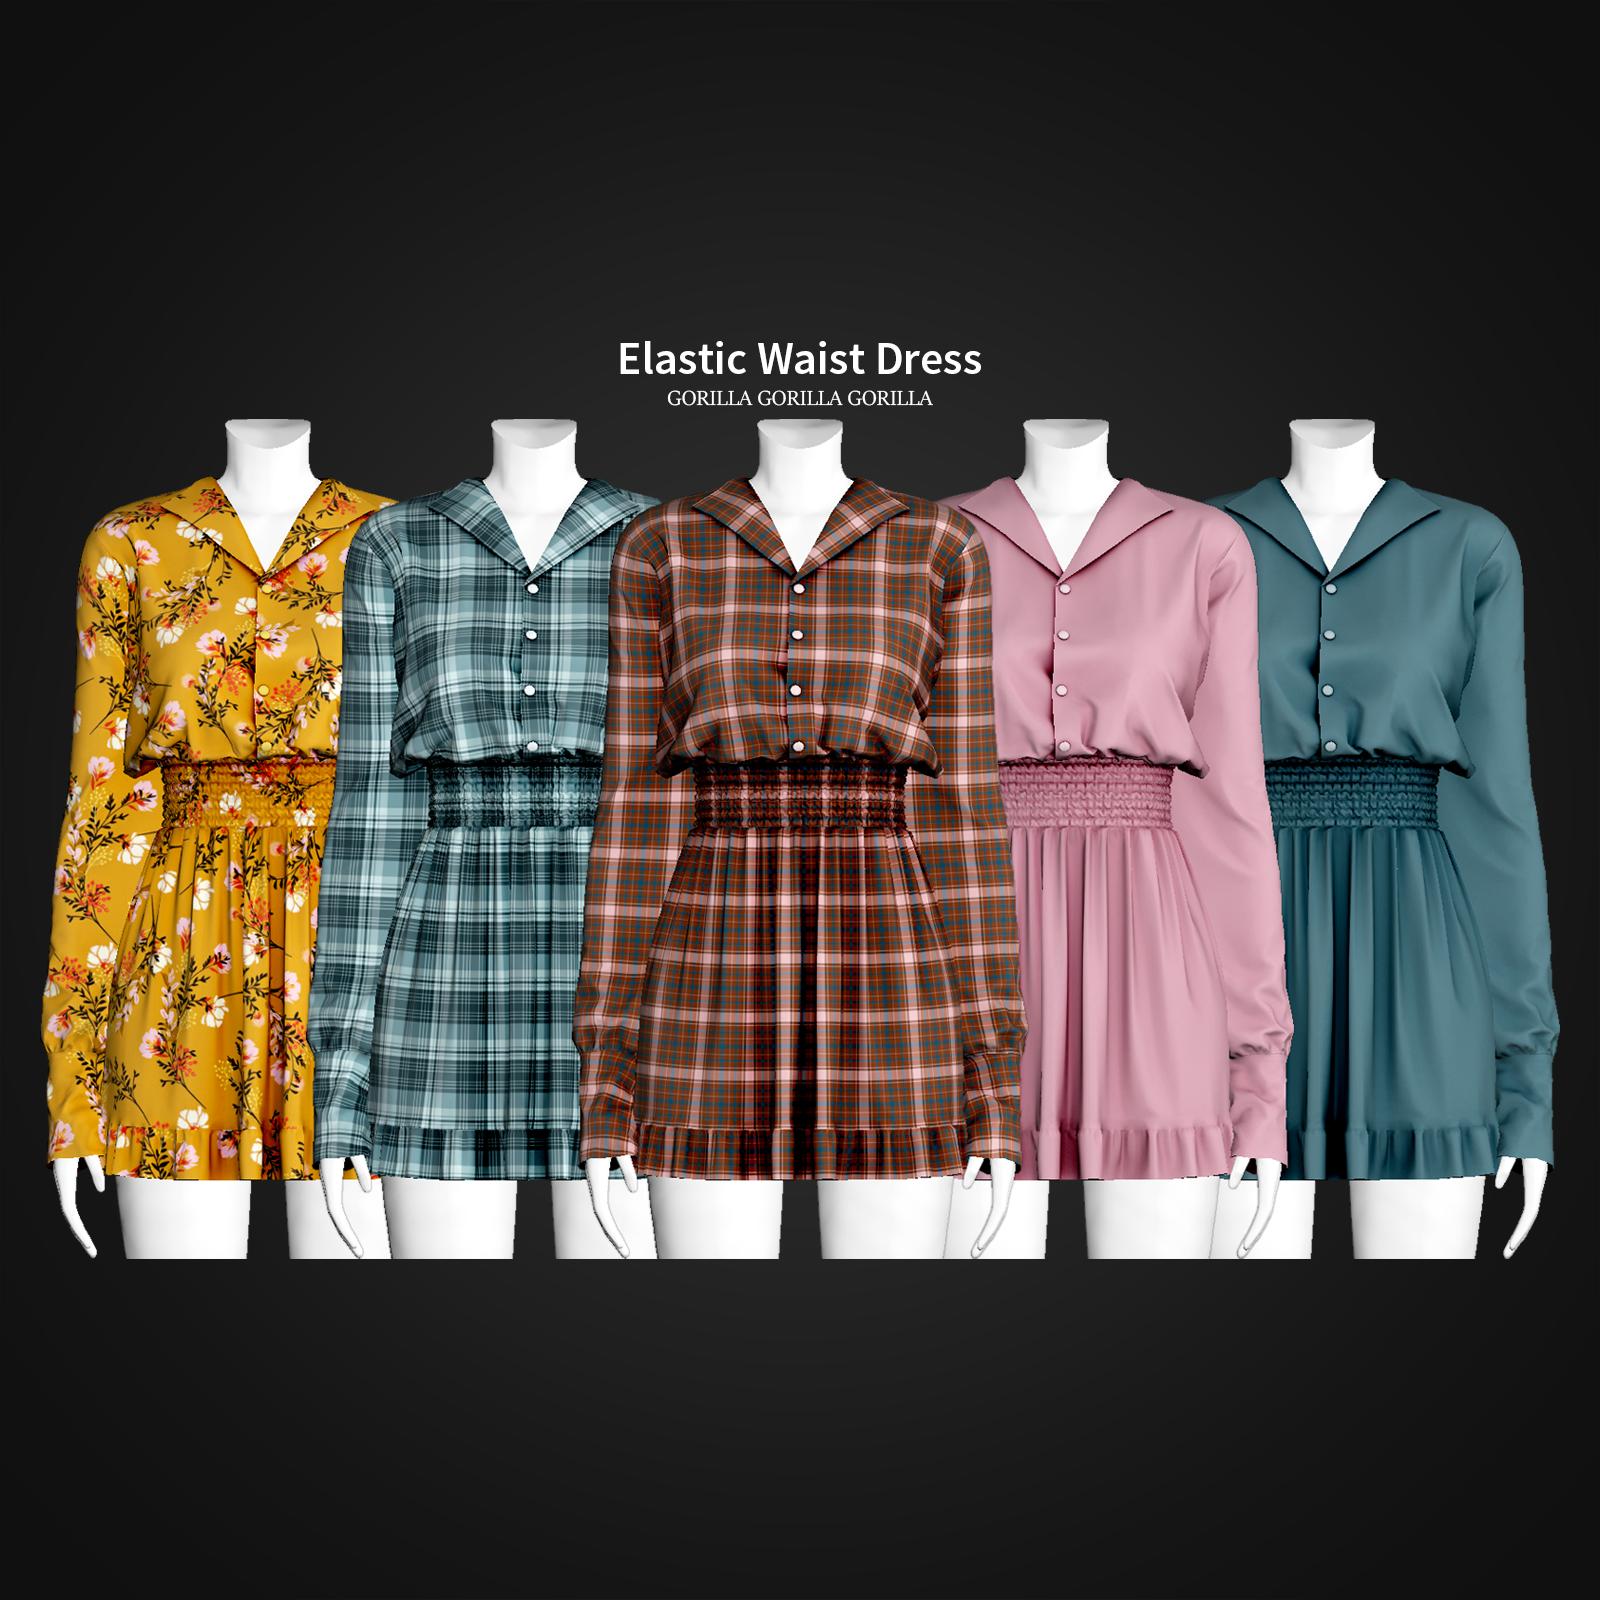 Elastic Waist Dress by Gorilla